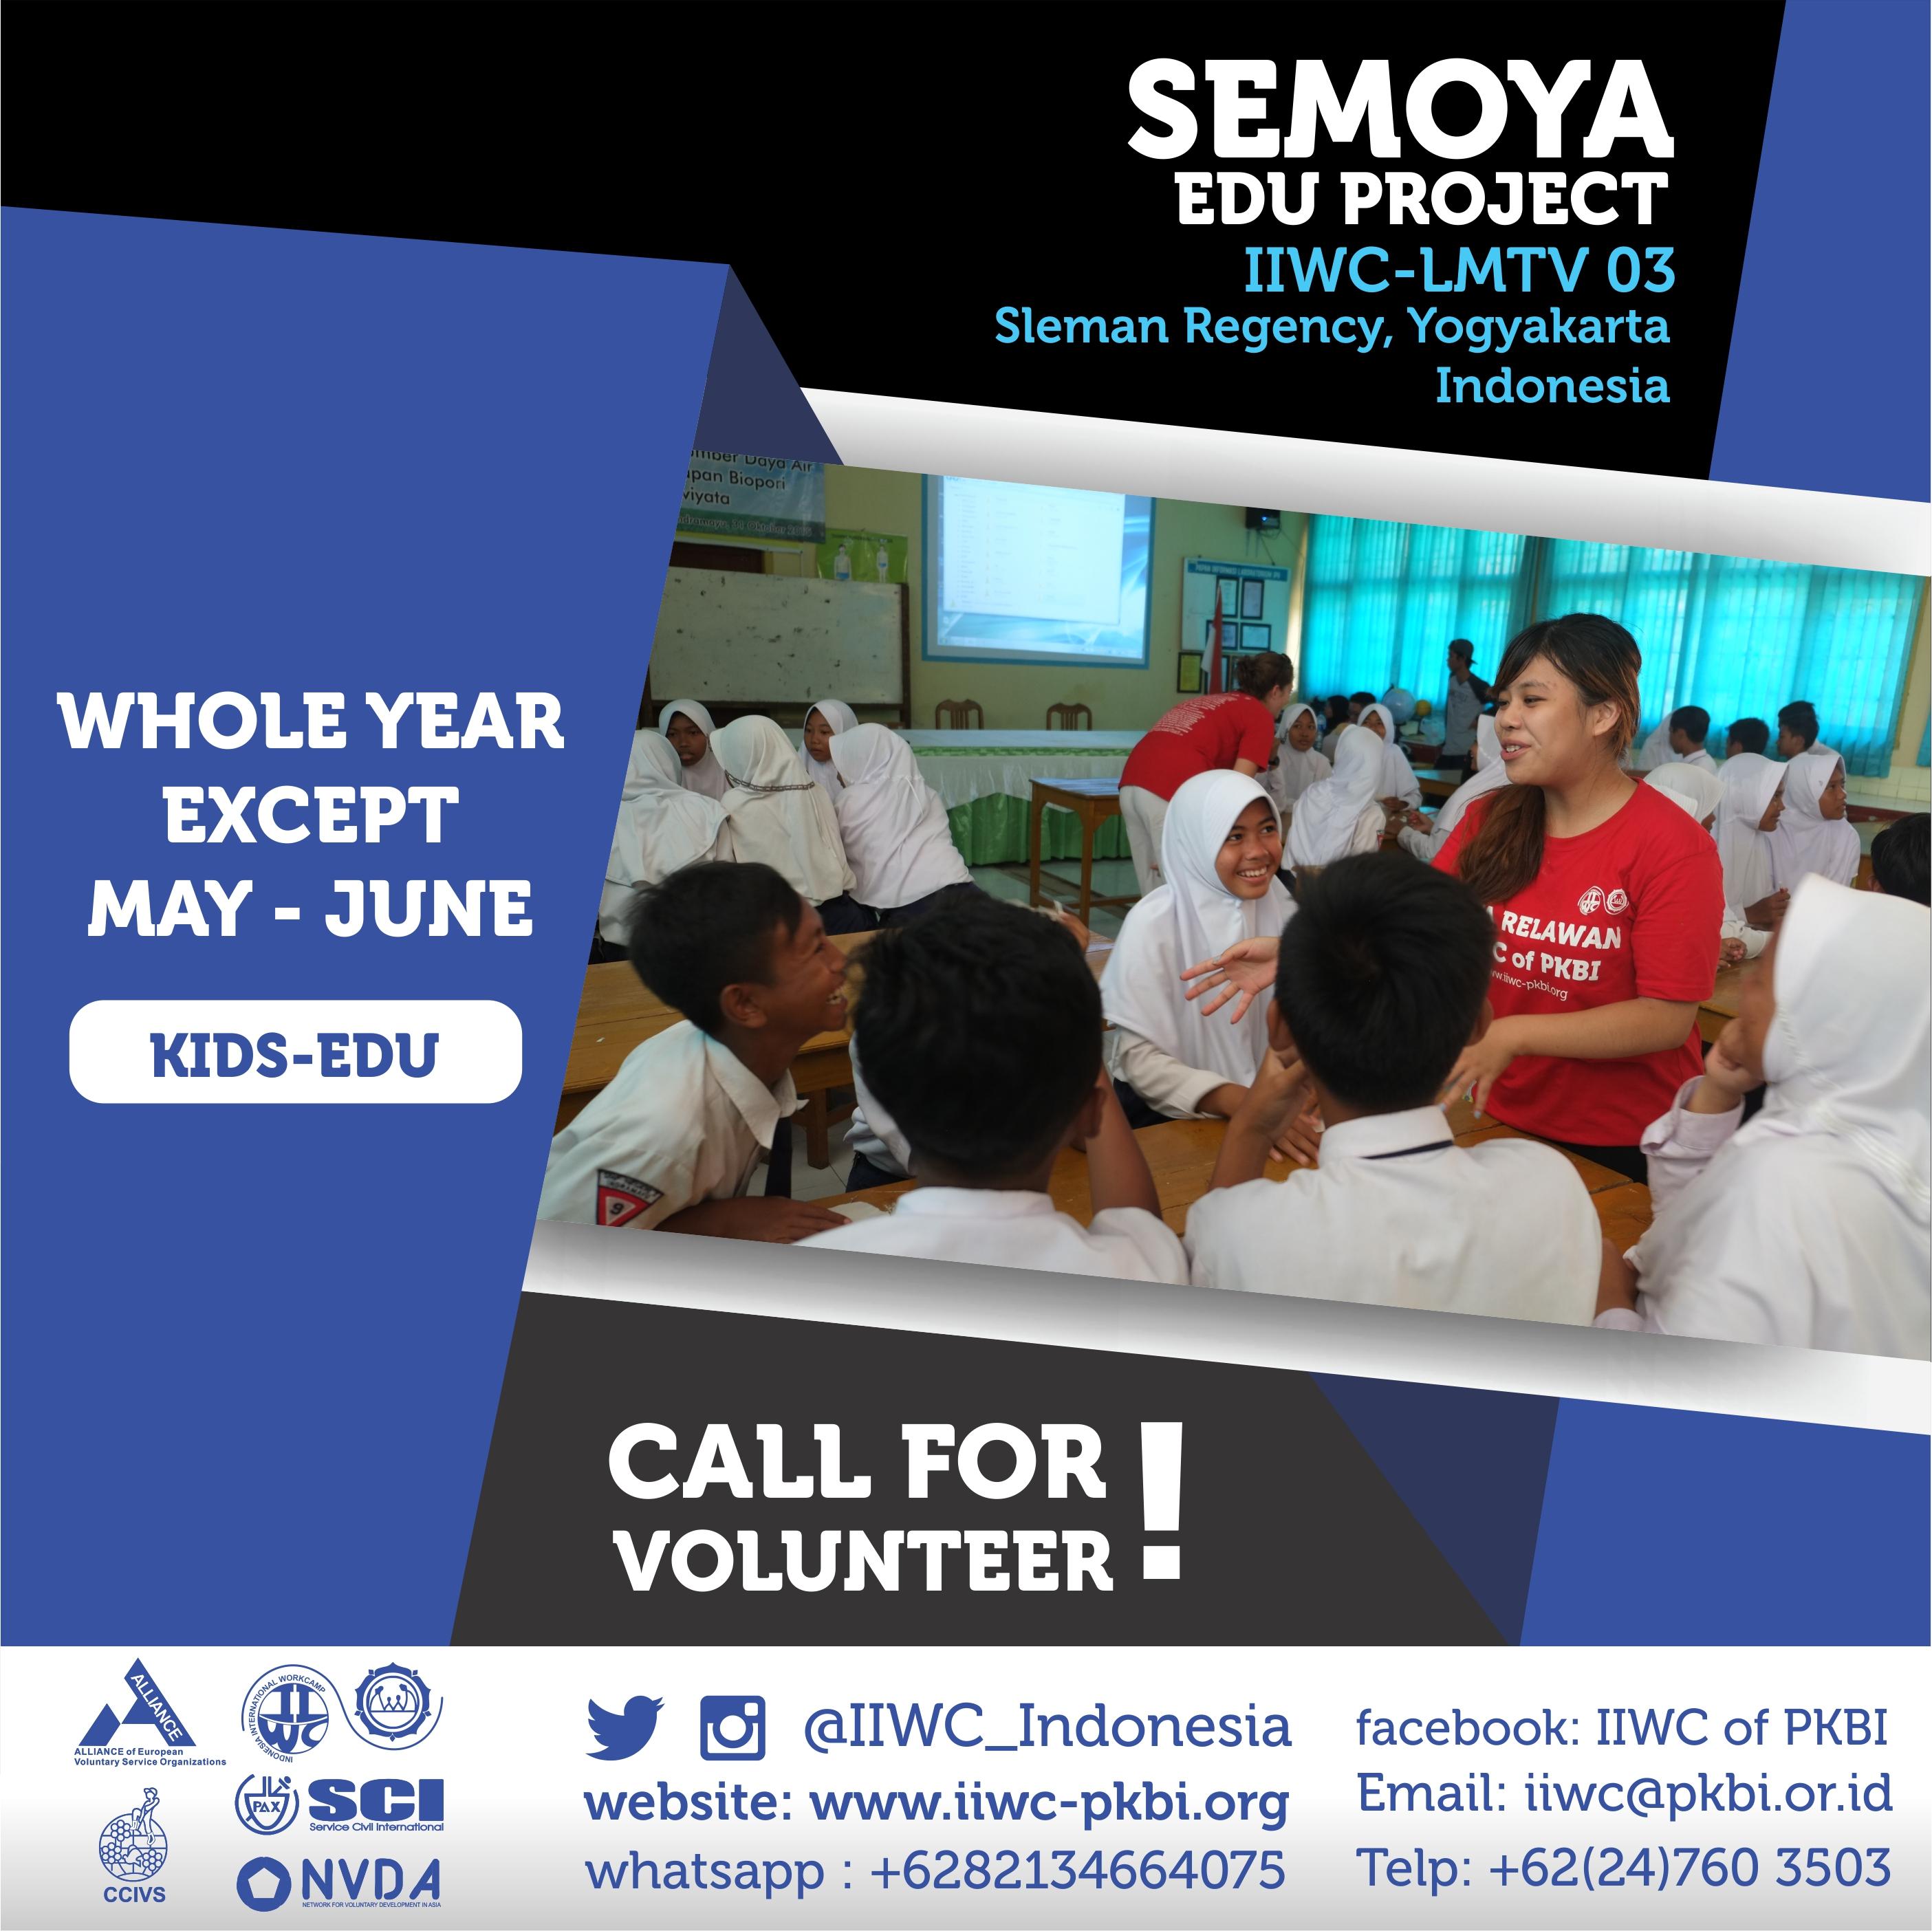 volunteer project: SEMOYA EDUCATION PROJECT photo 1